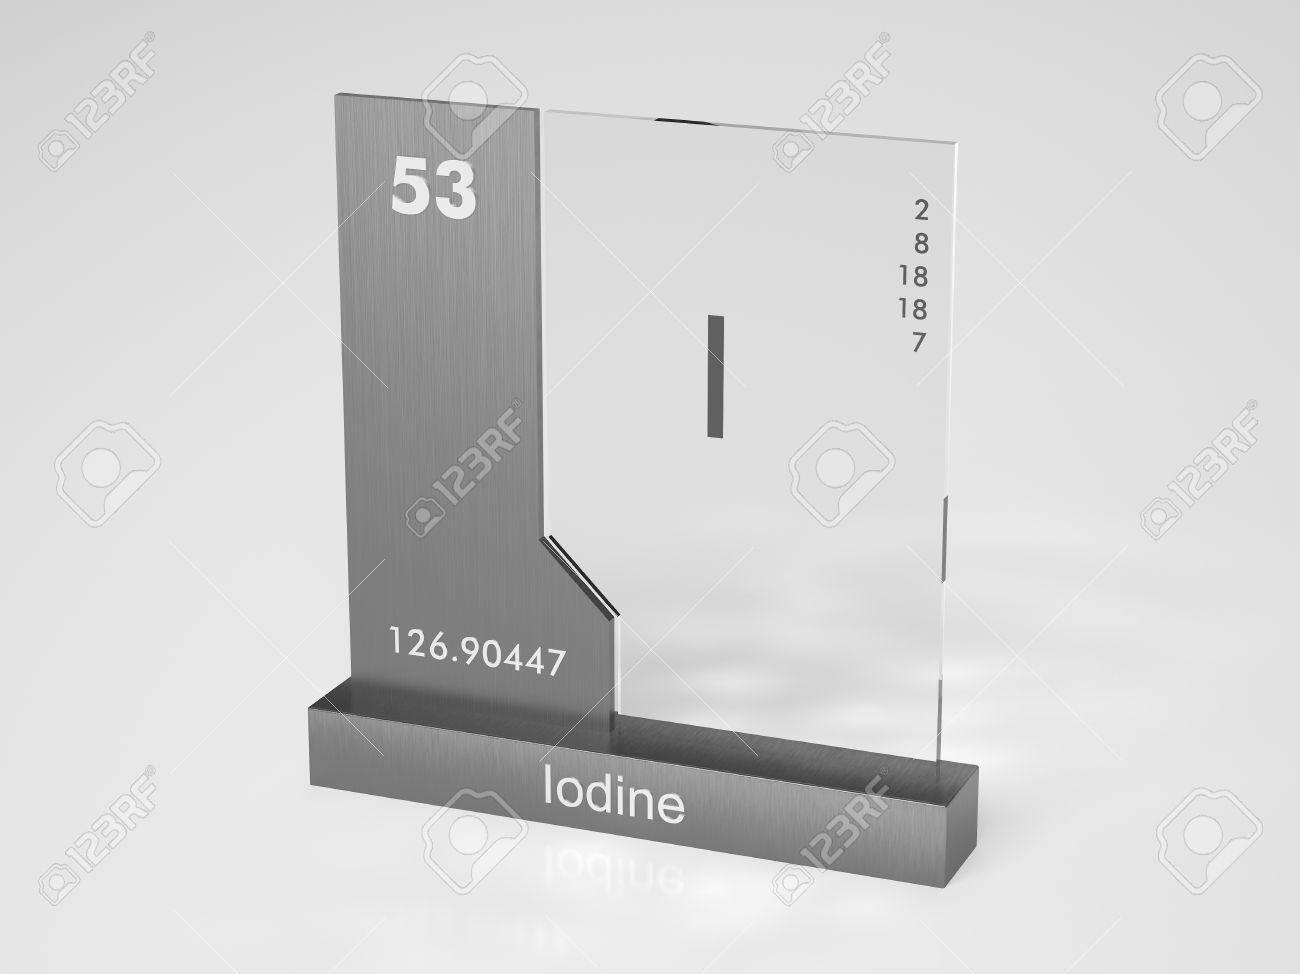 Iodine symbol i chemical element of the periodic table stock iodine symbol i chemical element of the periodic table stock photo 10470007 urtaz Choice Image